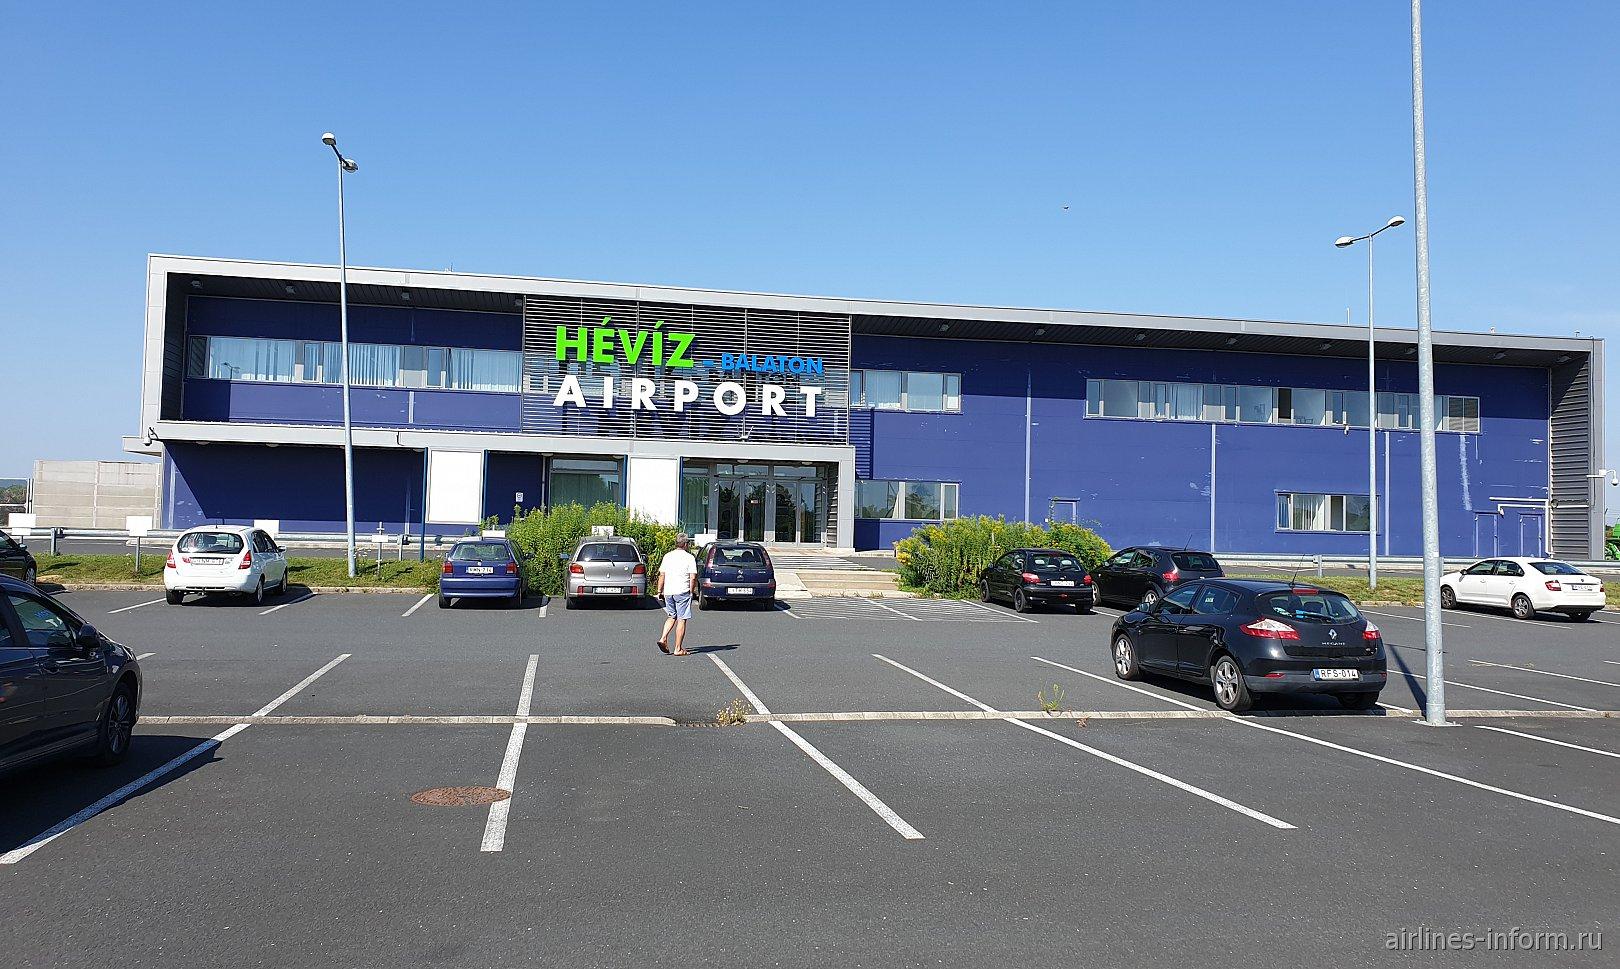 Пассажирский терминал аэропорта Хевиз-Балатон